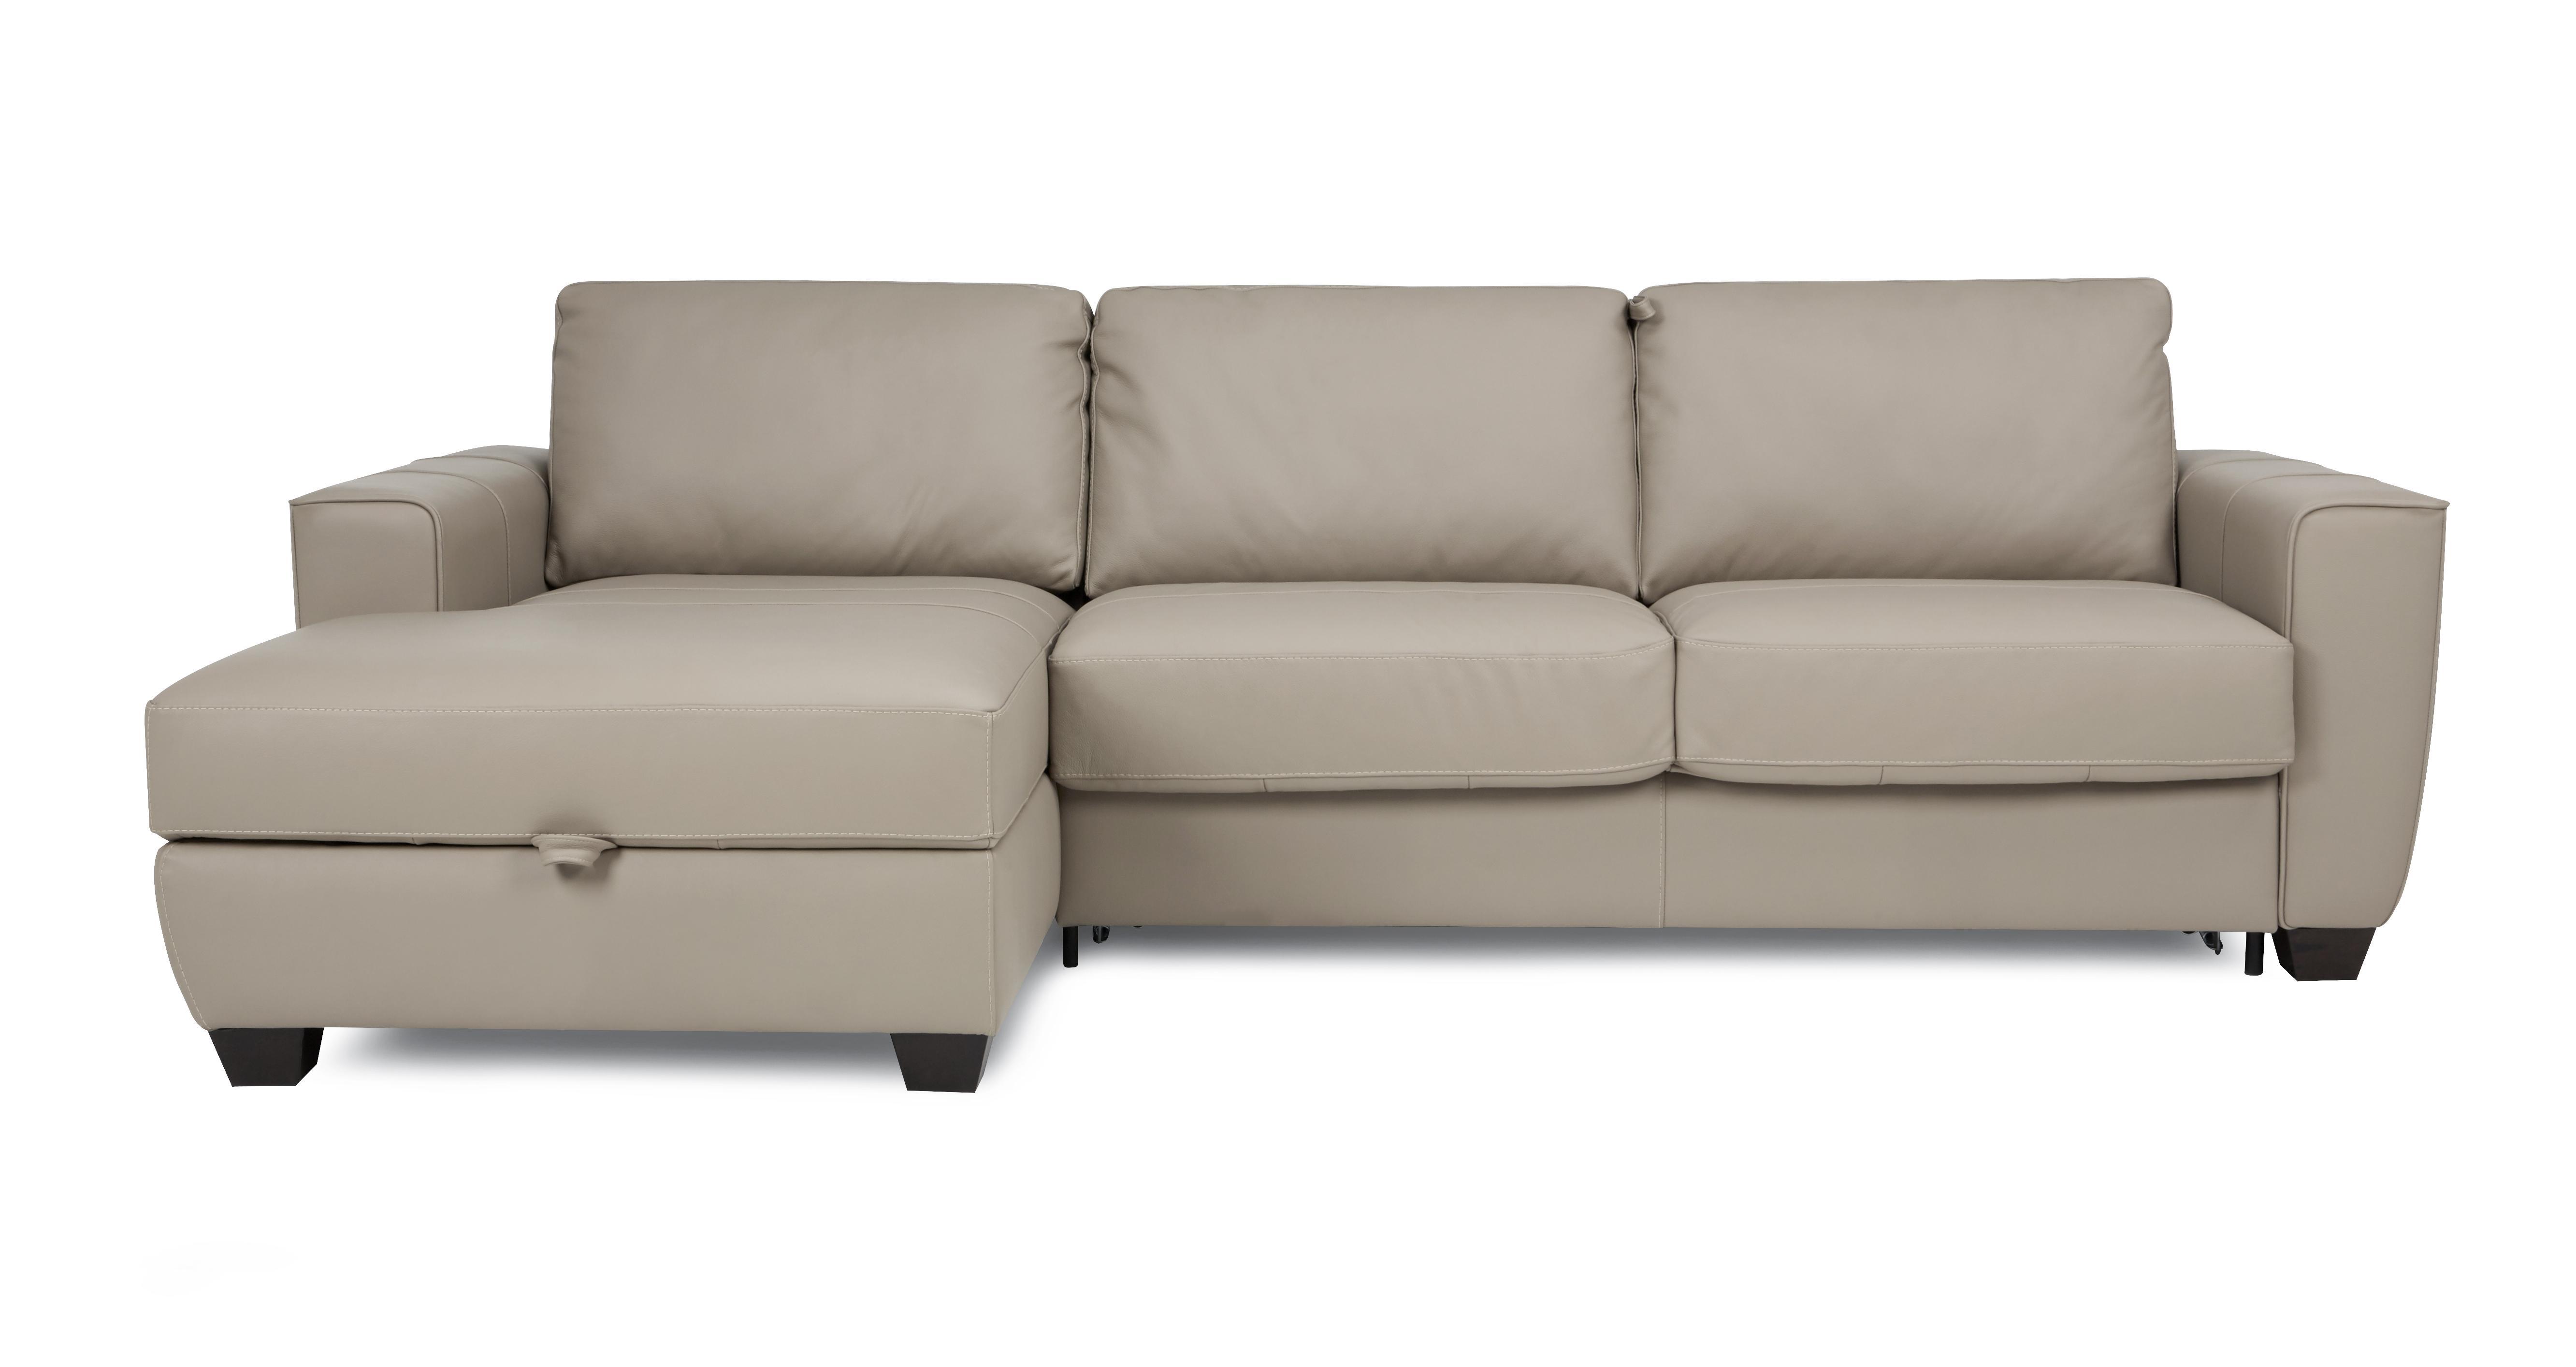 world leather multiple futon sofa bycast faux kp colors of c adjustable futons